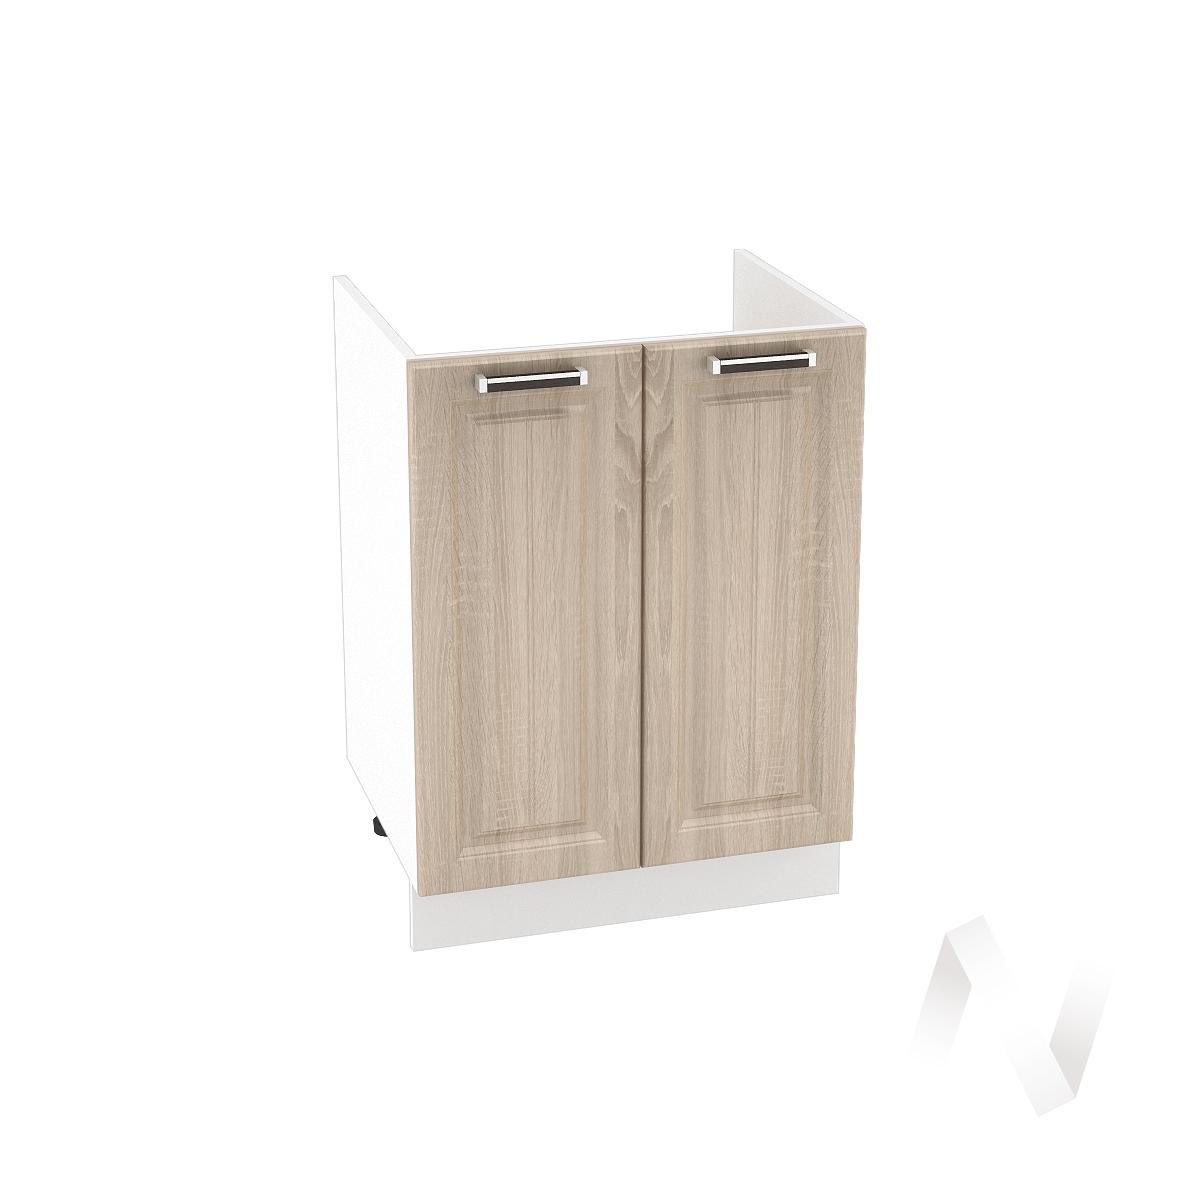 "Кухня ""Прага"": Шкаф нижний под мойку 600, ШНМ 600 (дуб сонома/корпус белый)"